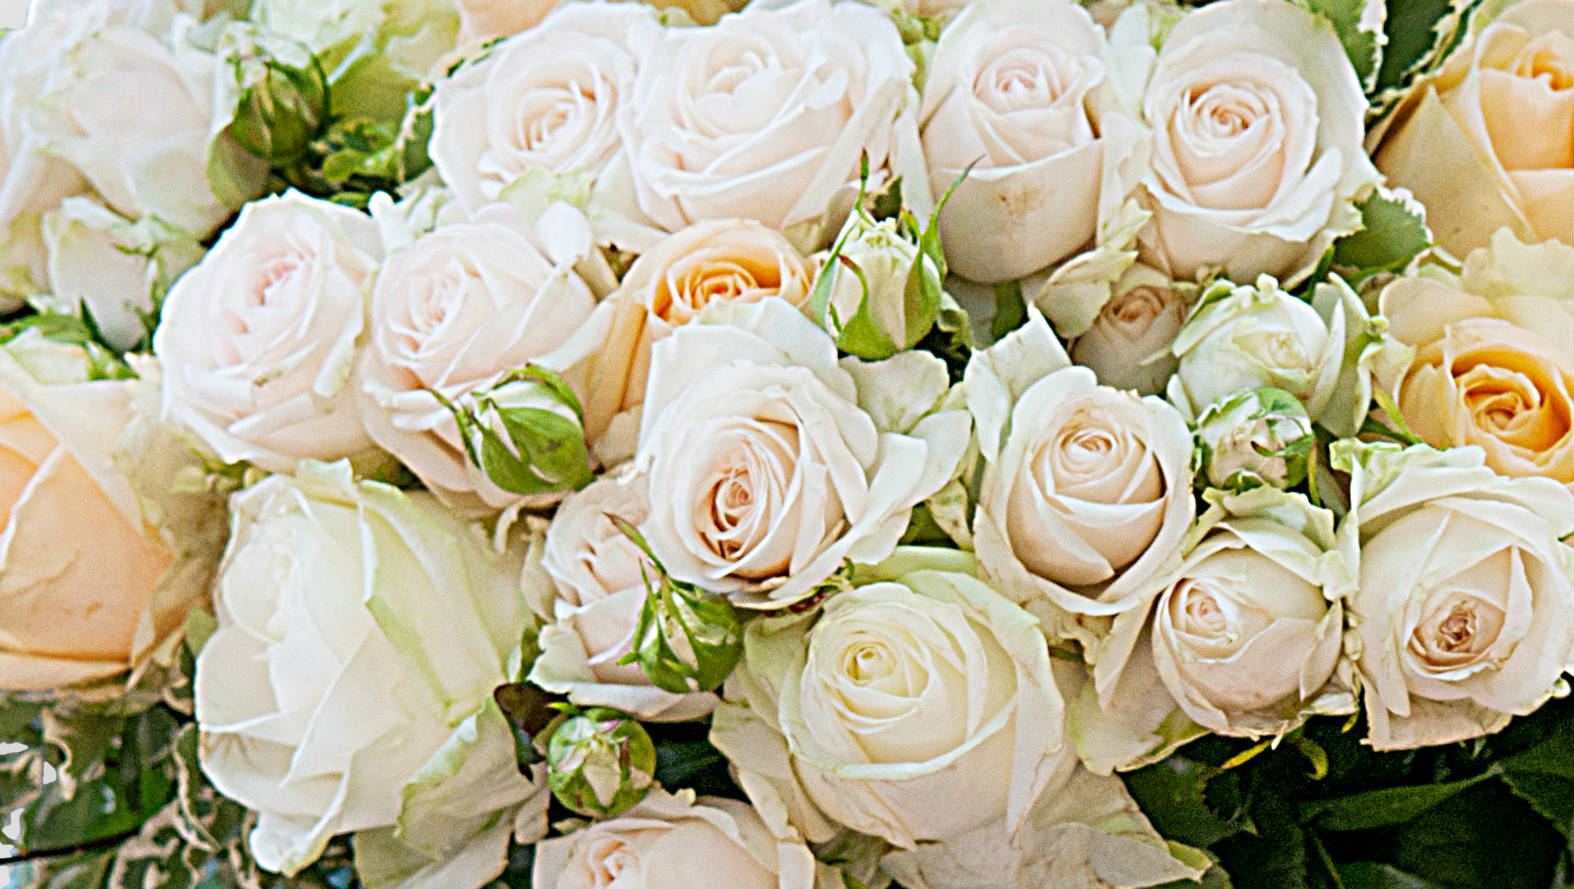 saint-germain-bouquet-flower-station.jpg